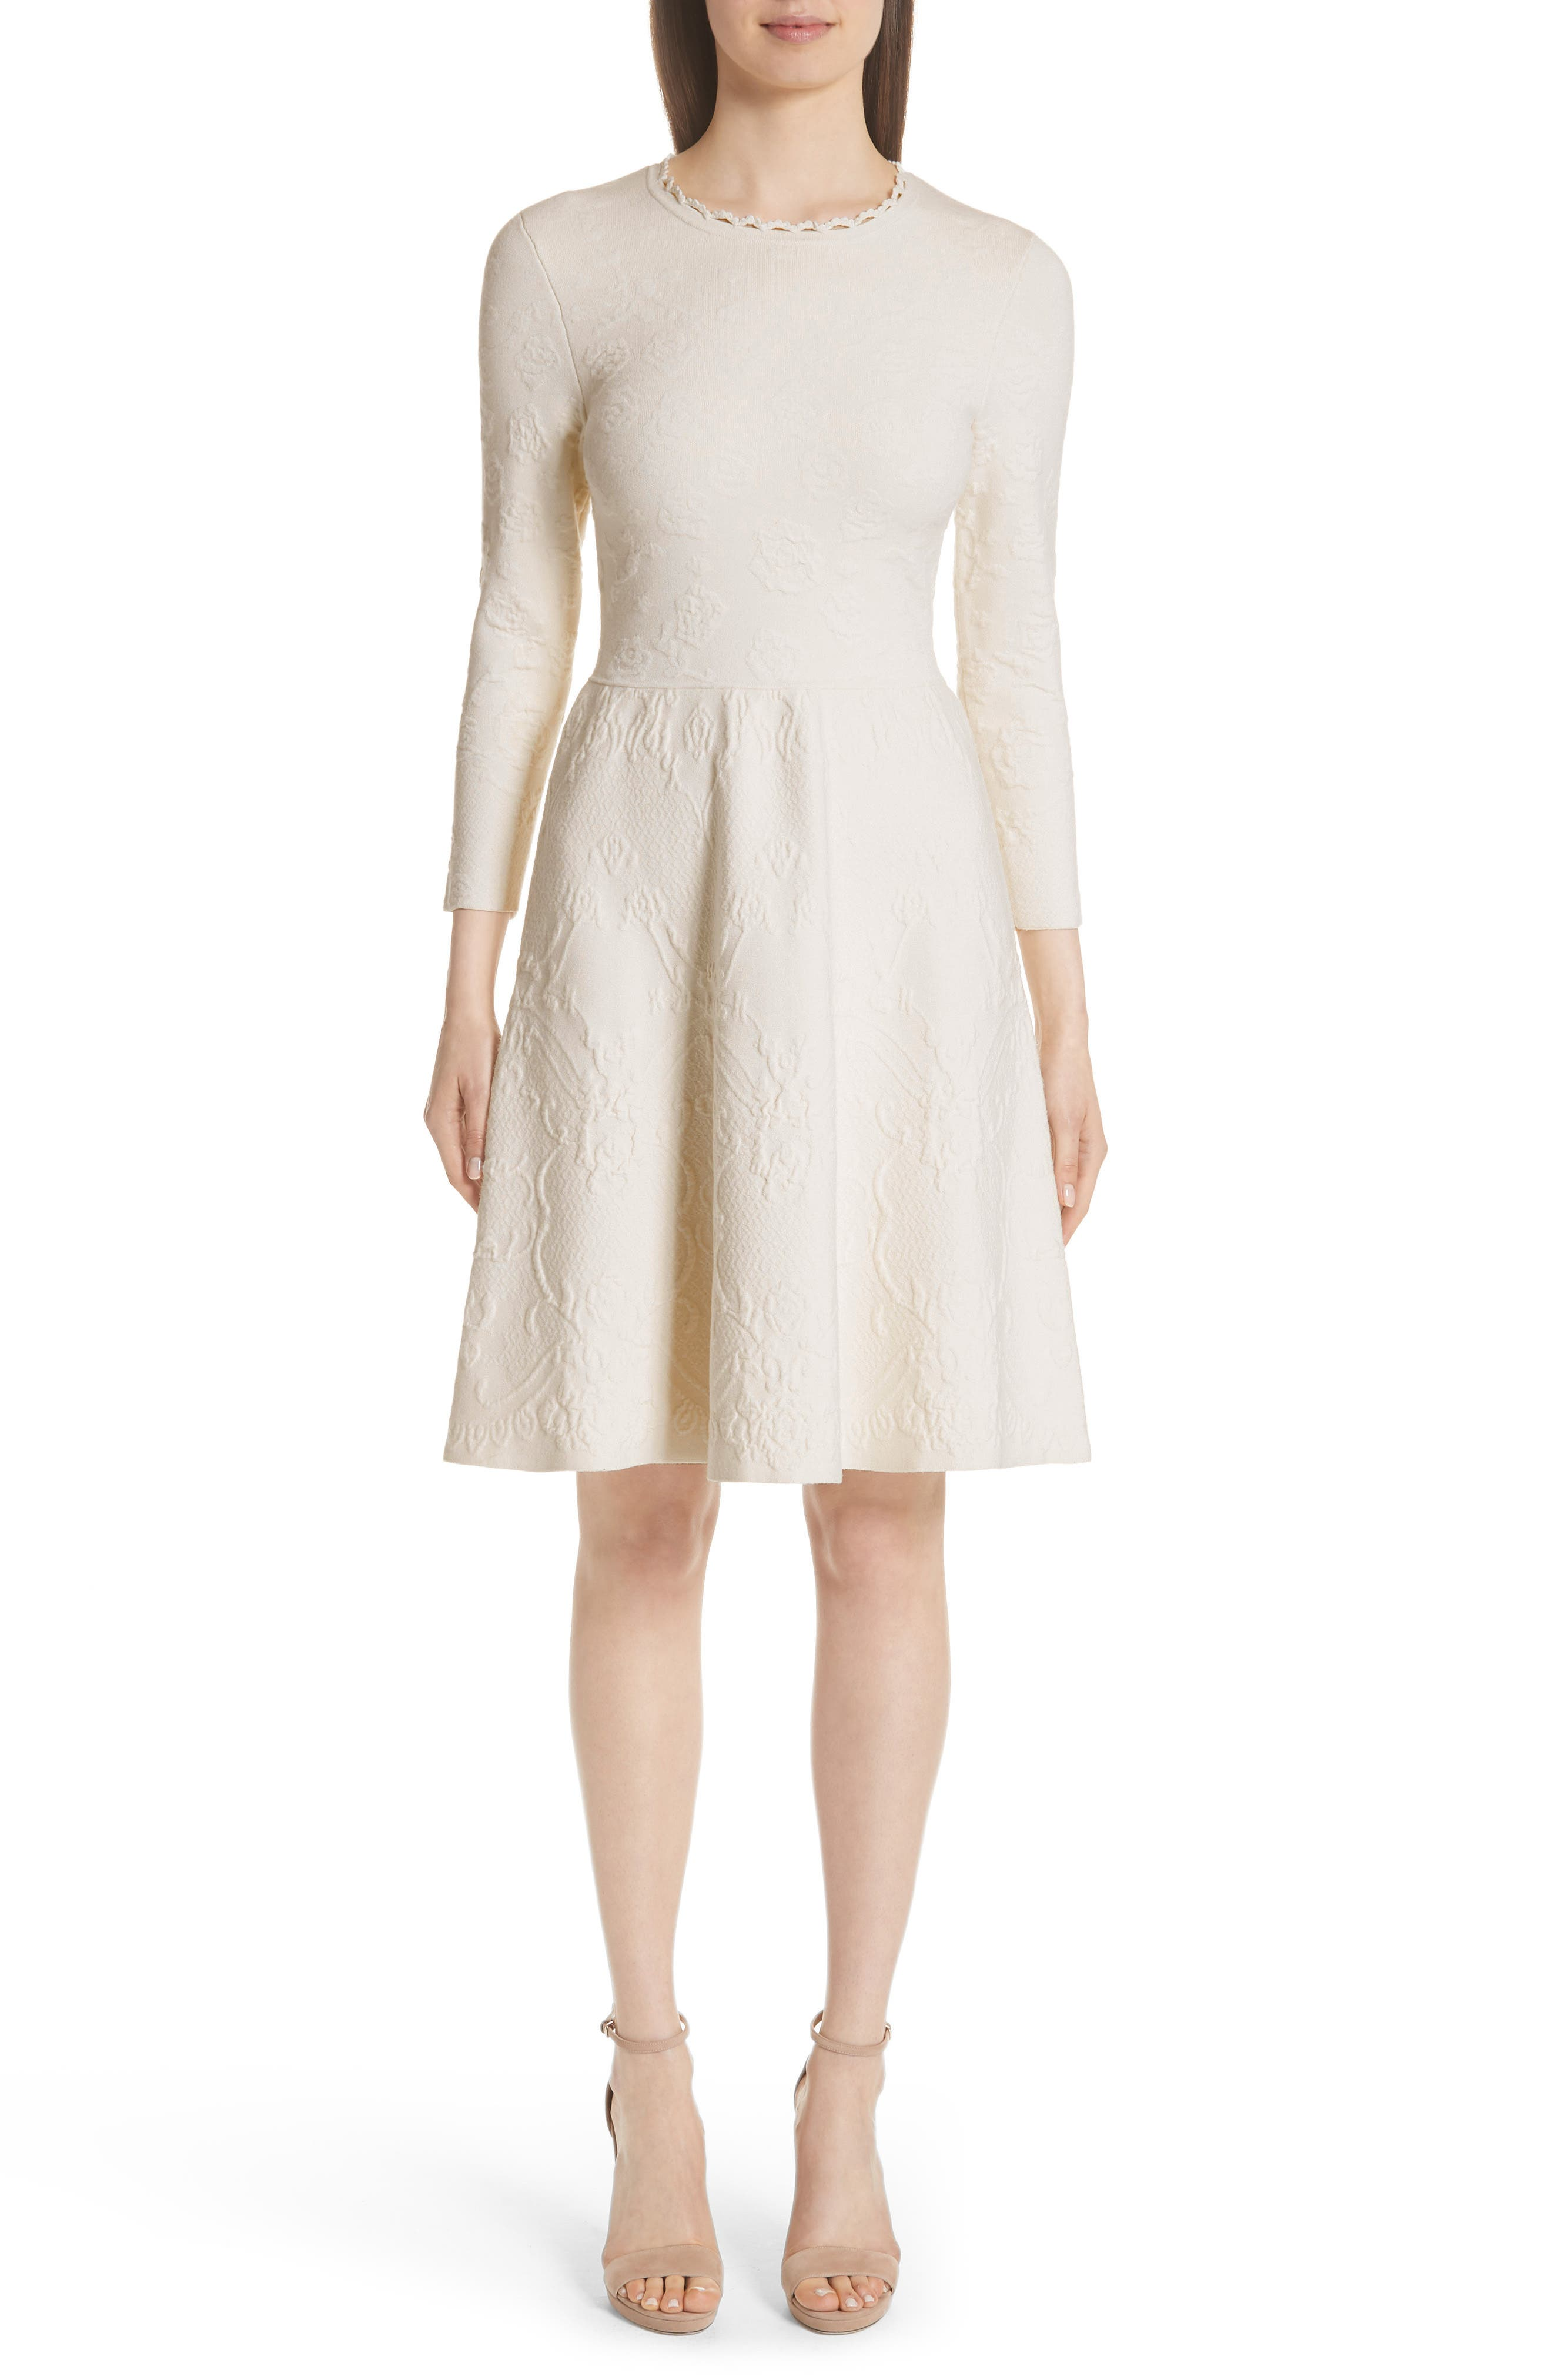 MATELASSE FIT & FLARE DRESS